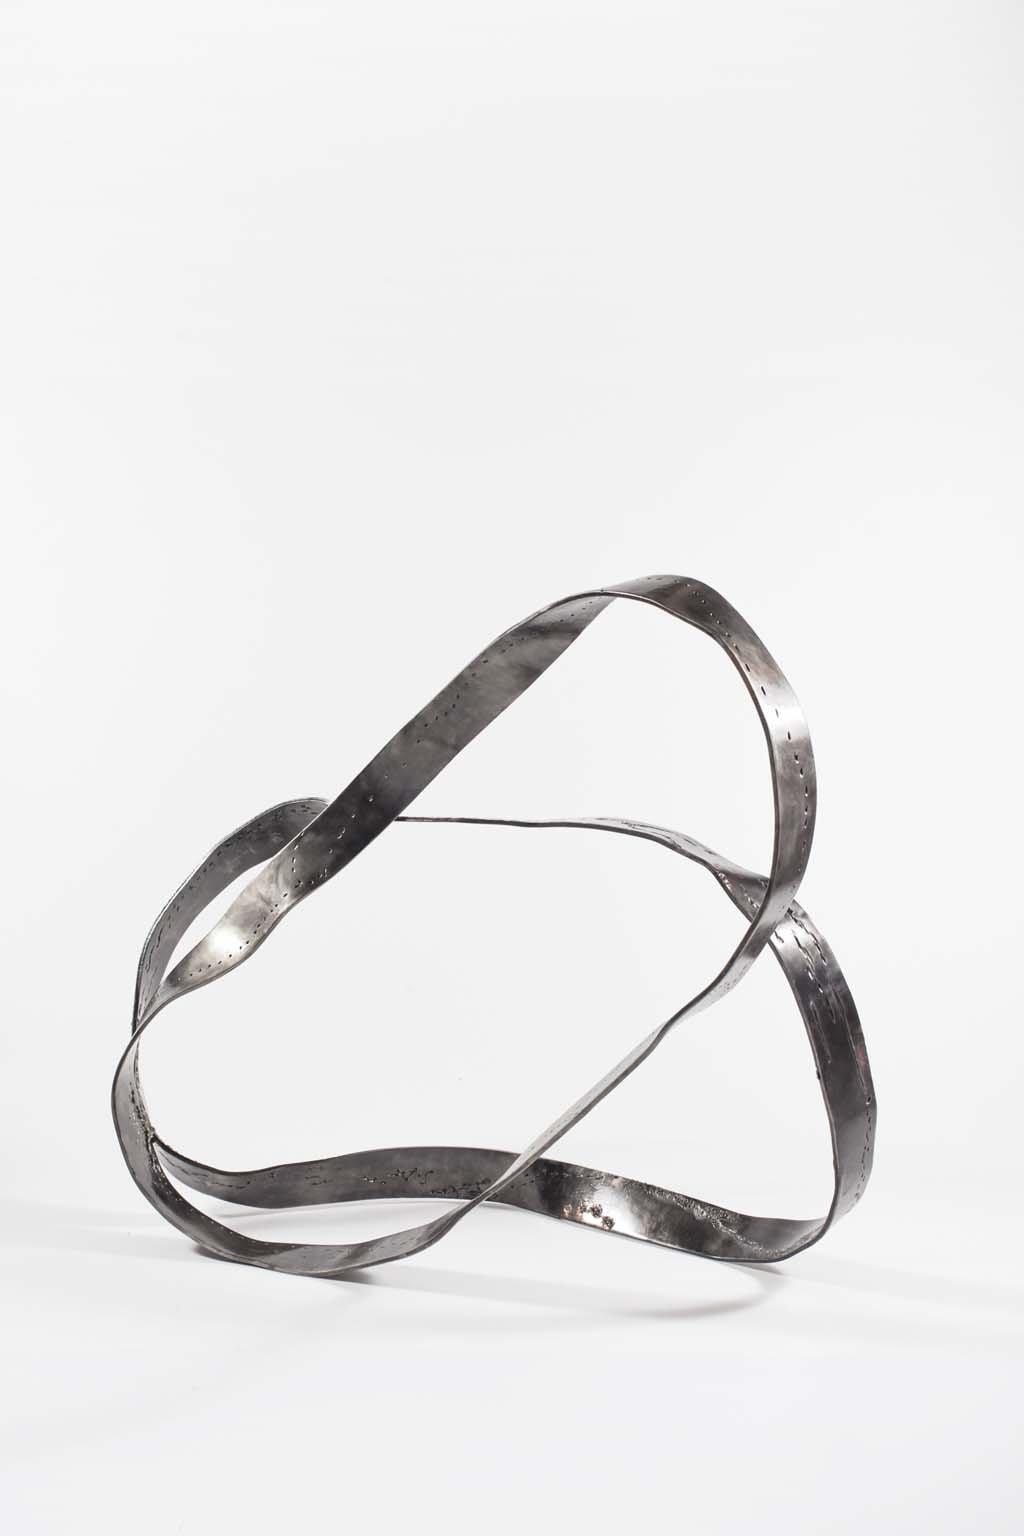 Oblivion I | 2015 I  Iron & brass sculpture | Rami Ater | רמי אטר